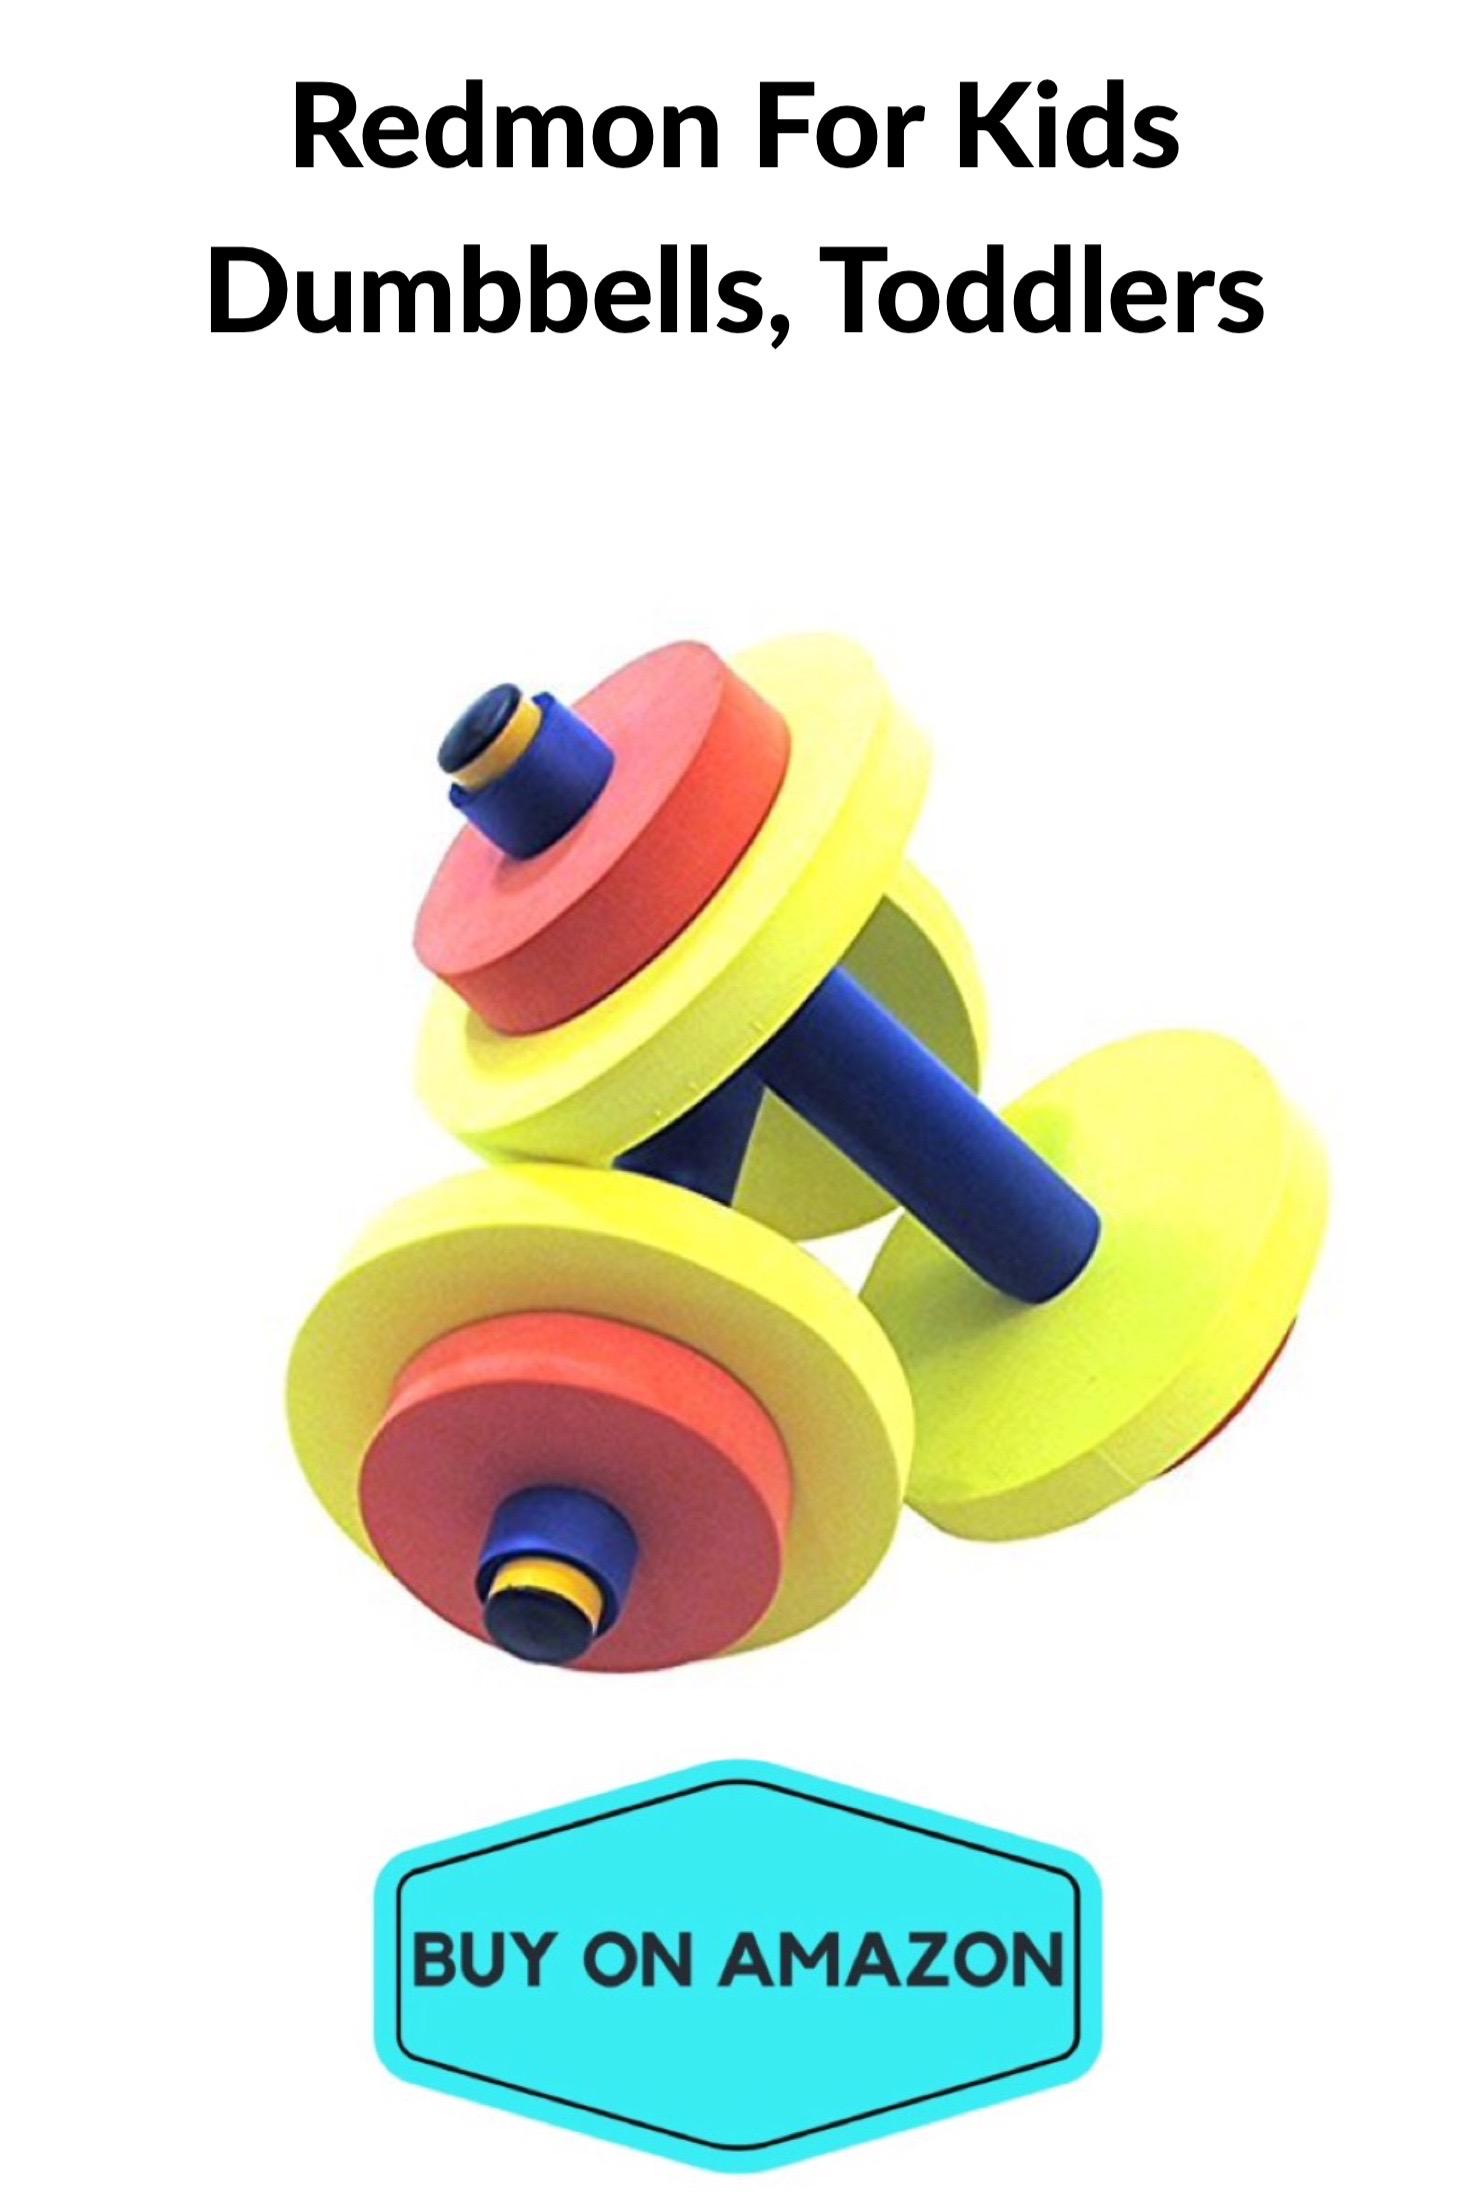 Redmon Play Weight Bench